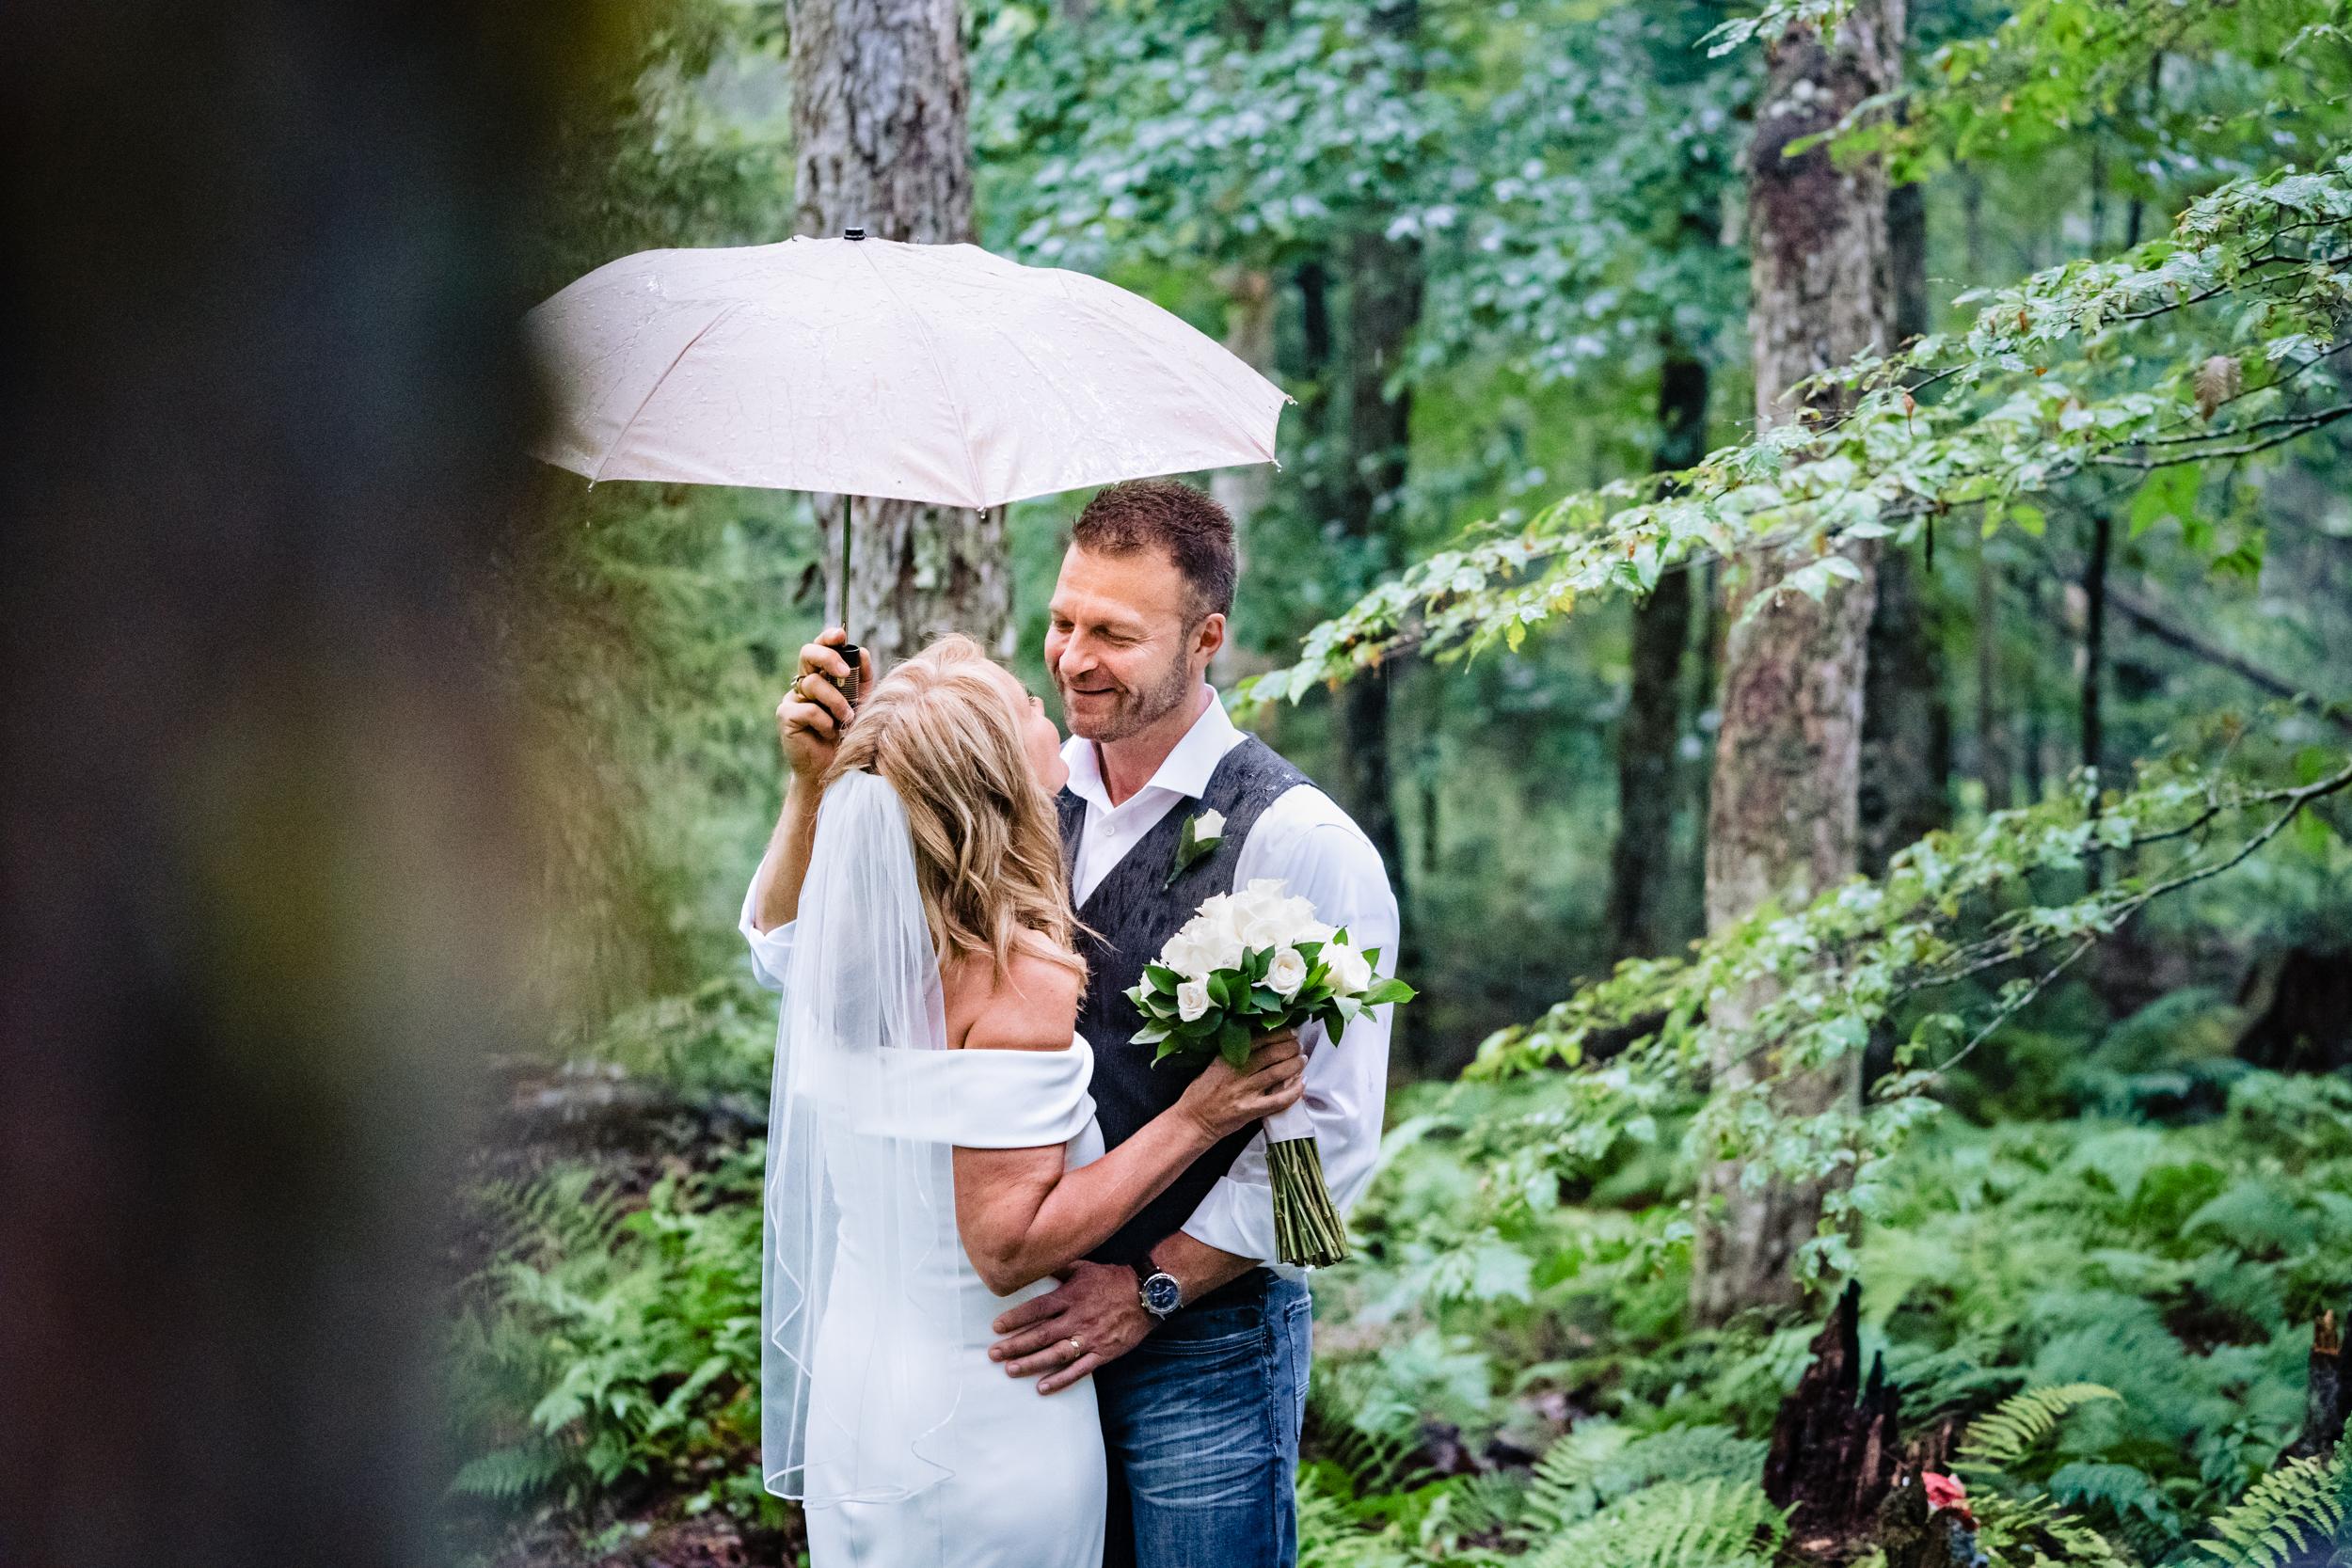 Halifax-wedding-photography-foxandfellow-nova-scotia-backyard-summer-canada-42.jpg